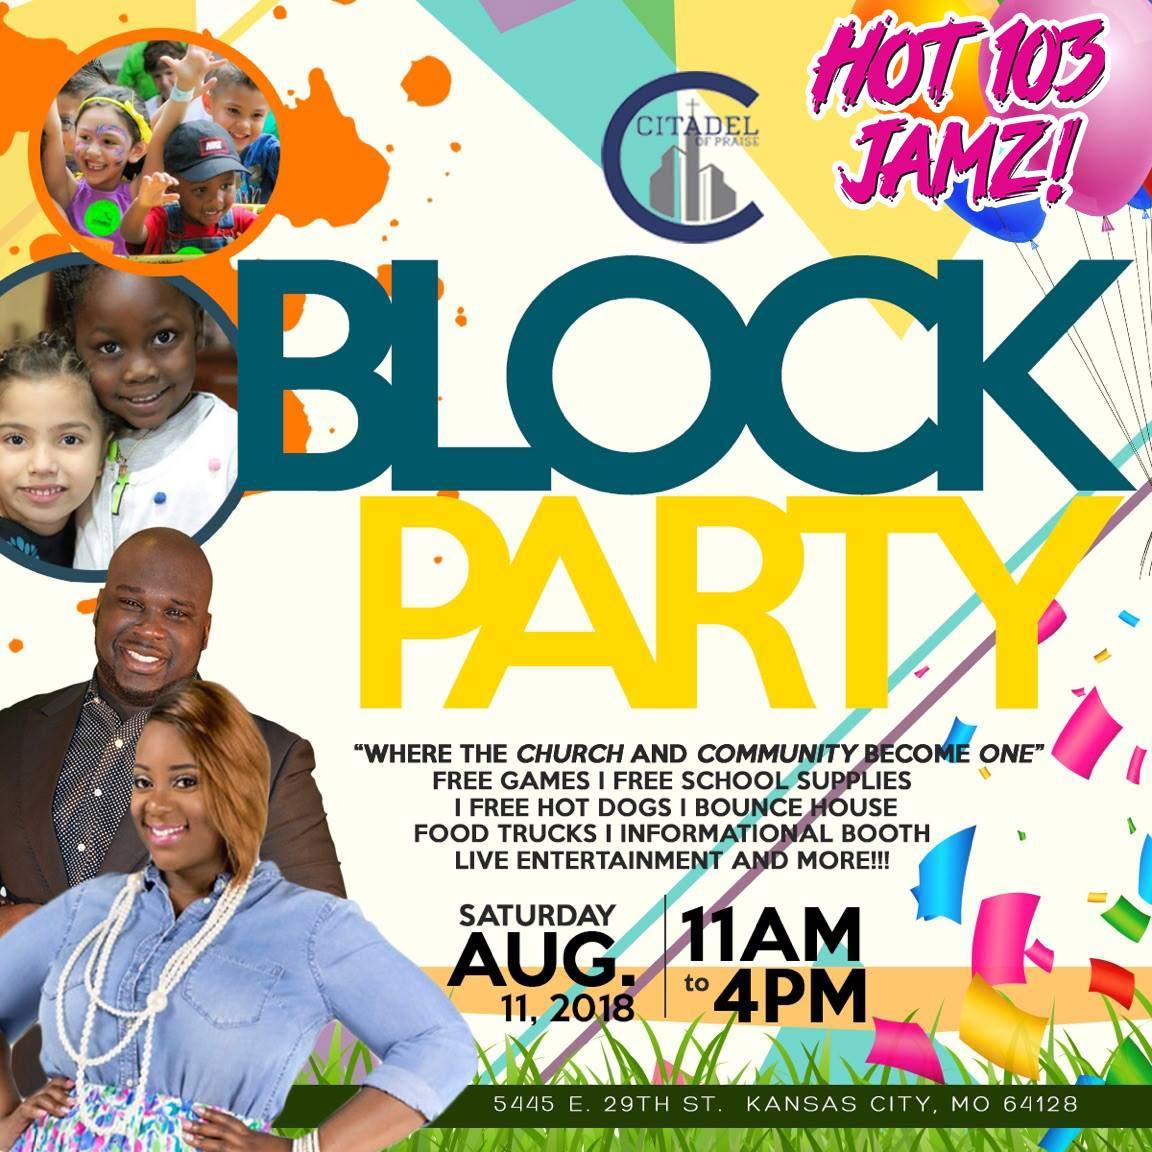 Citadel of Praise Block Party   Hot 103 Jamz!